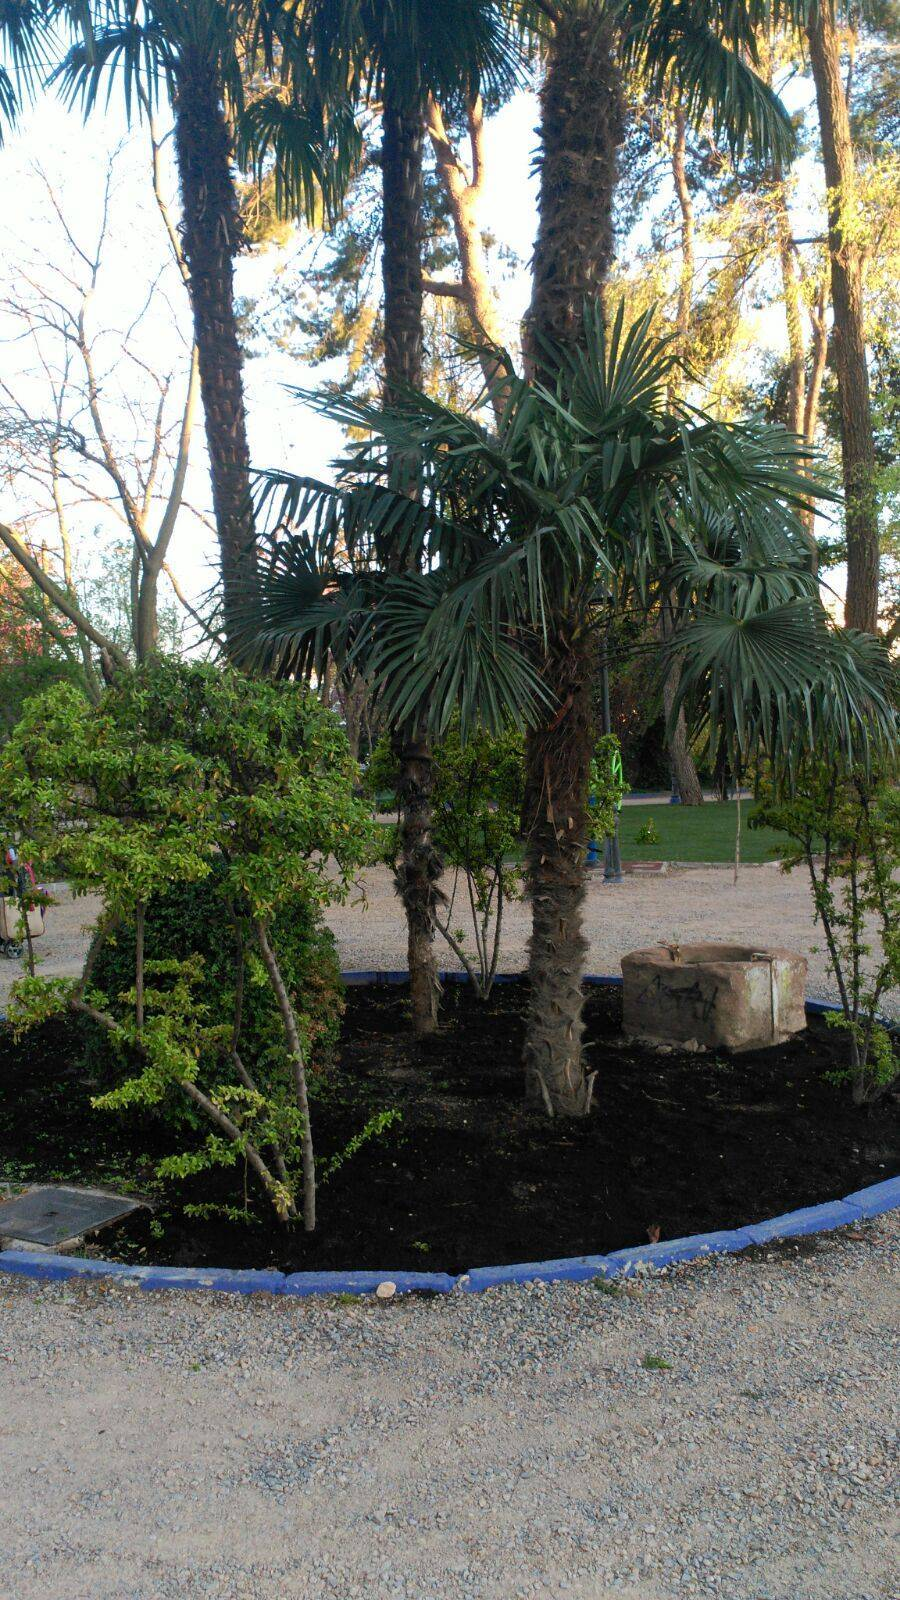 obras parque municipal casi acabadas herencia 2 - Las obras de renovación del Parque Municipal casi acabadas